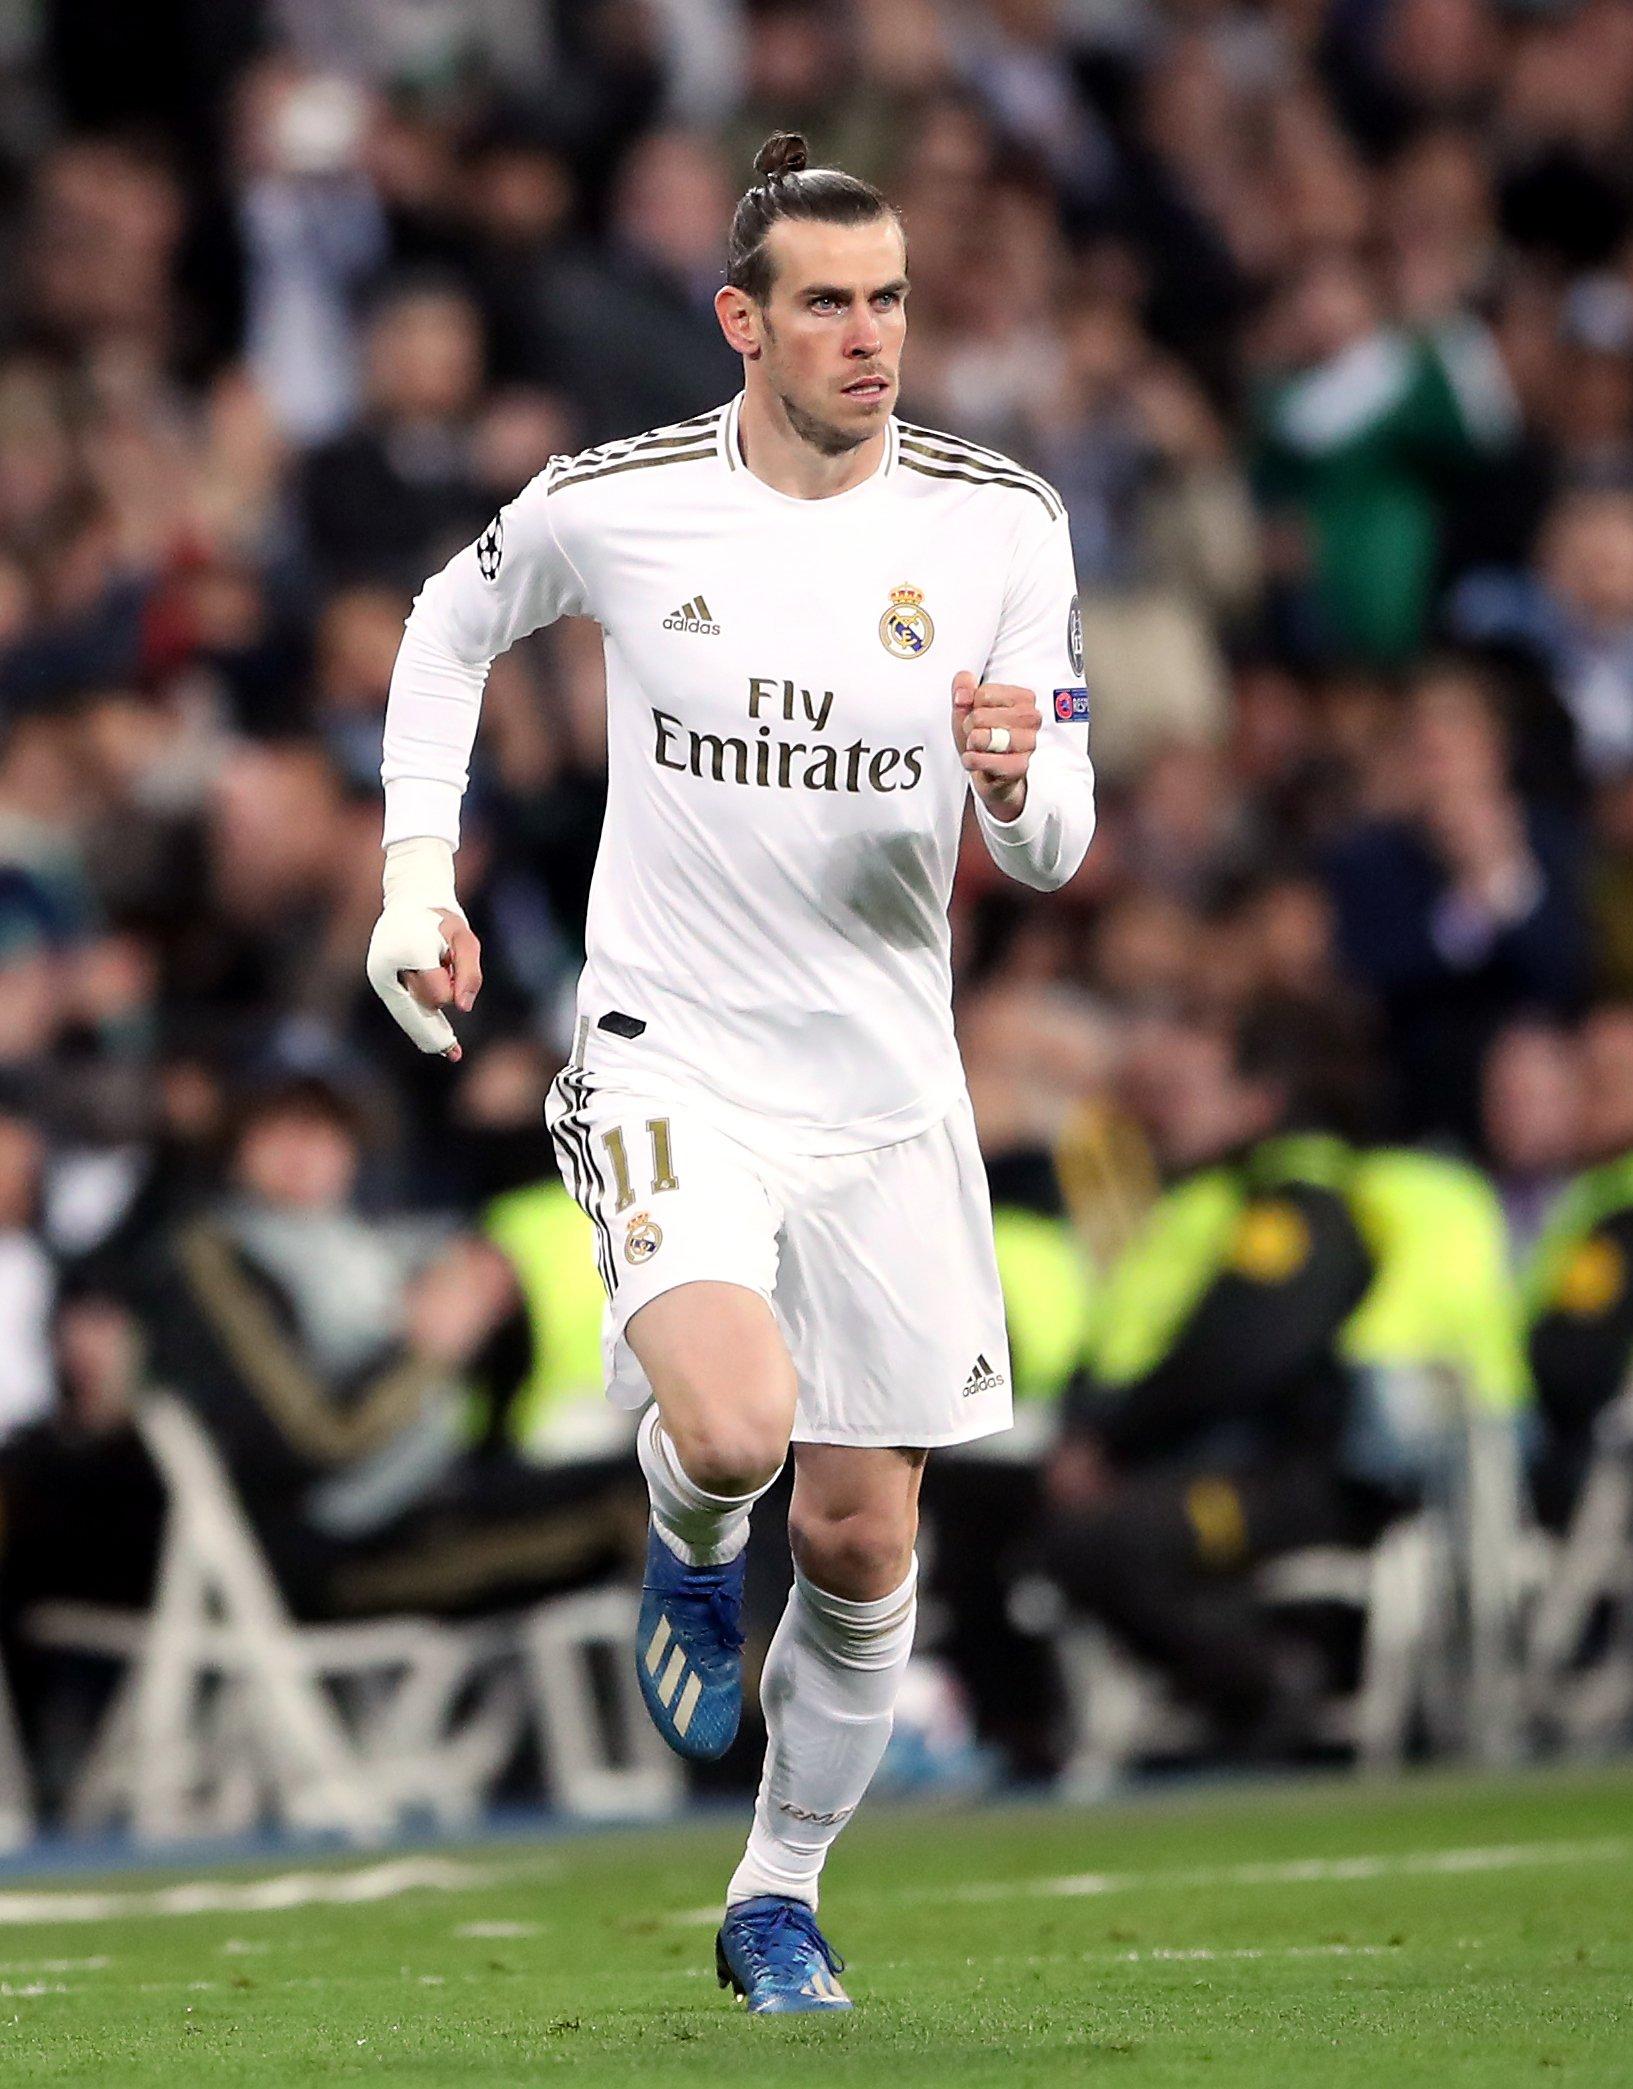 Gareth Bale chose not to be involved against Manchester City – Zinedine Zidane